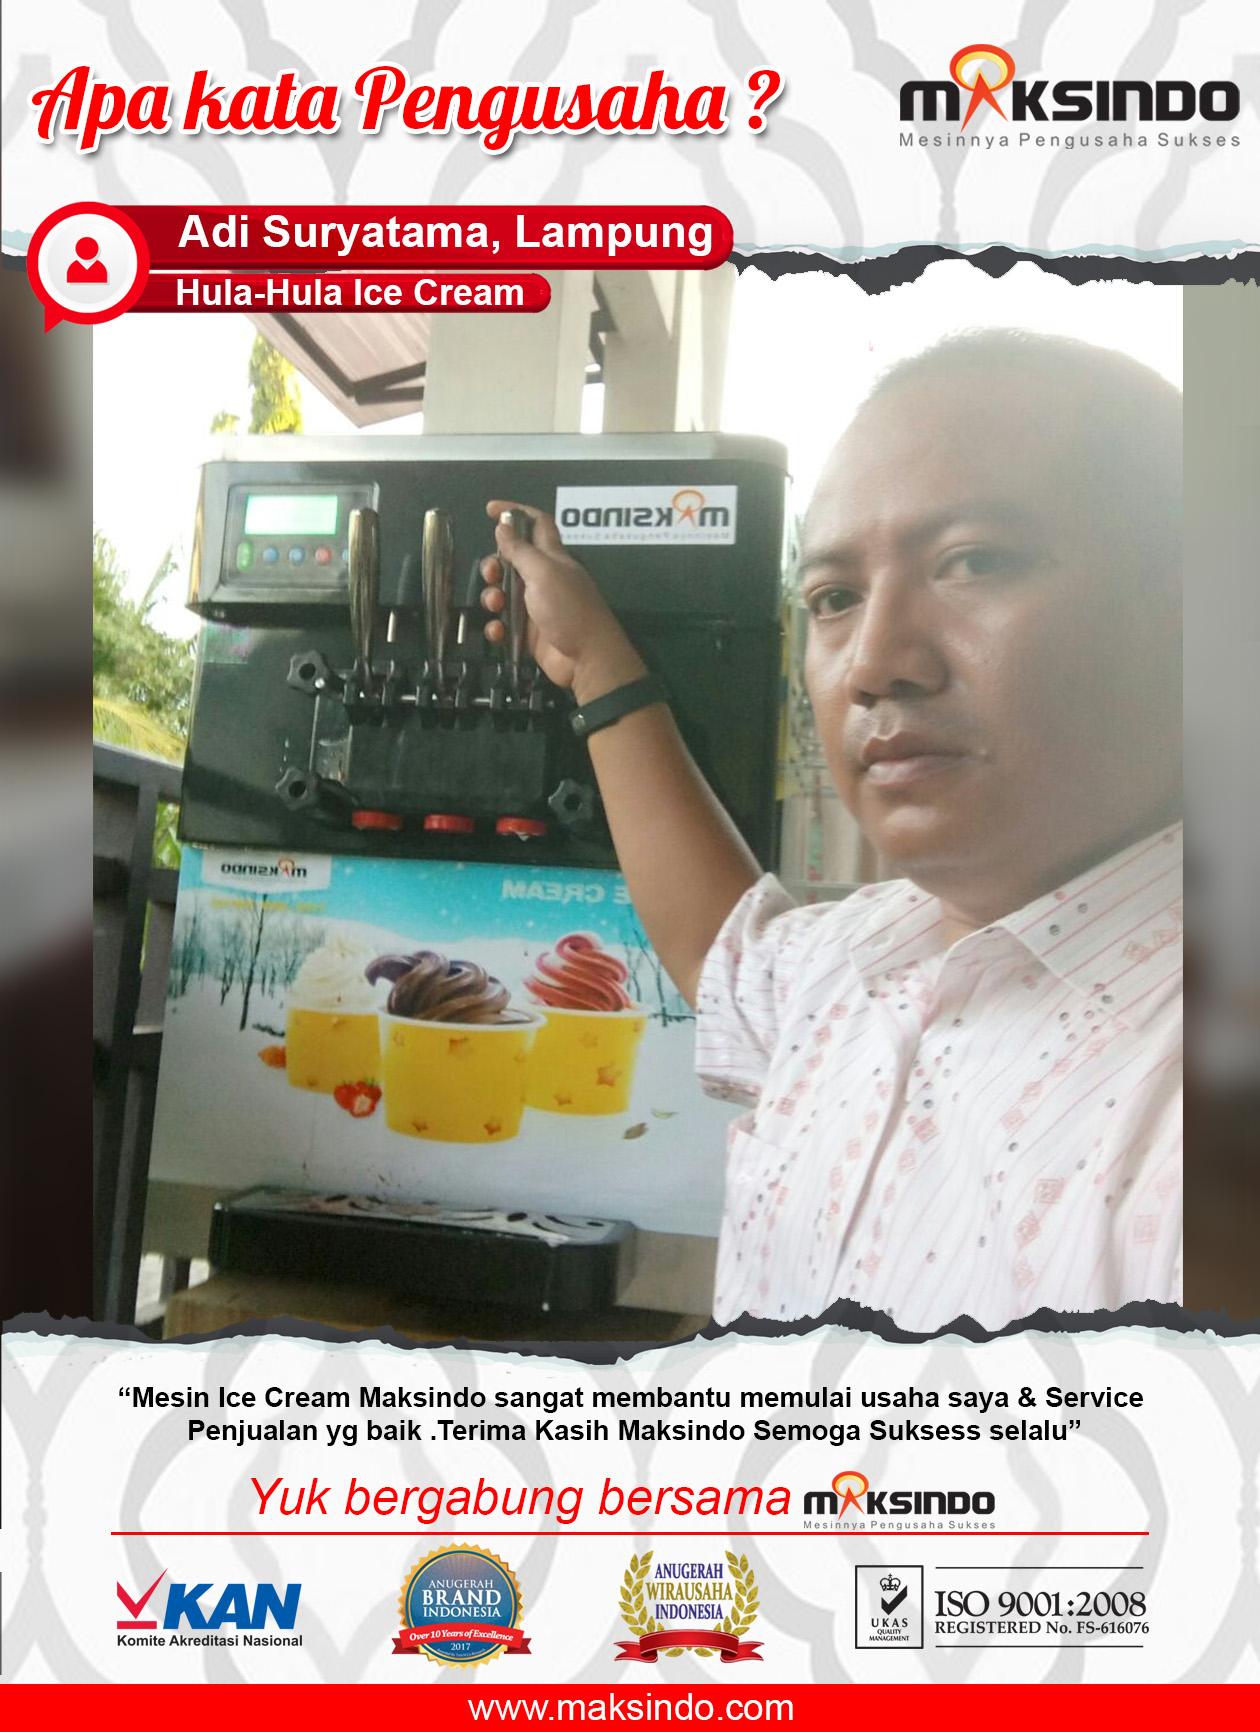 Hula-Hula Ice Cream : Mesin Ice Cream Maksindo Cocok Untuk Memulai Usaha